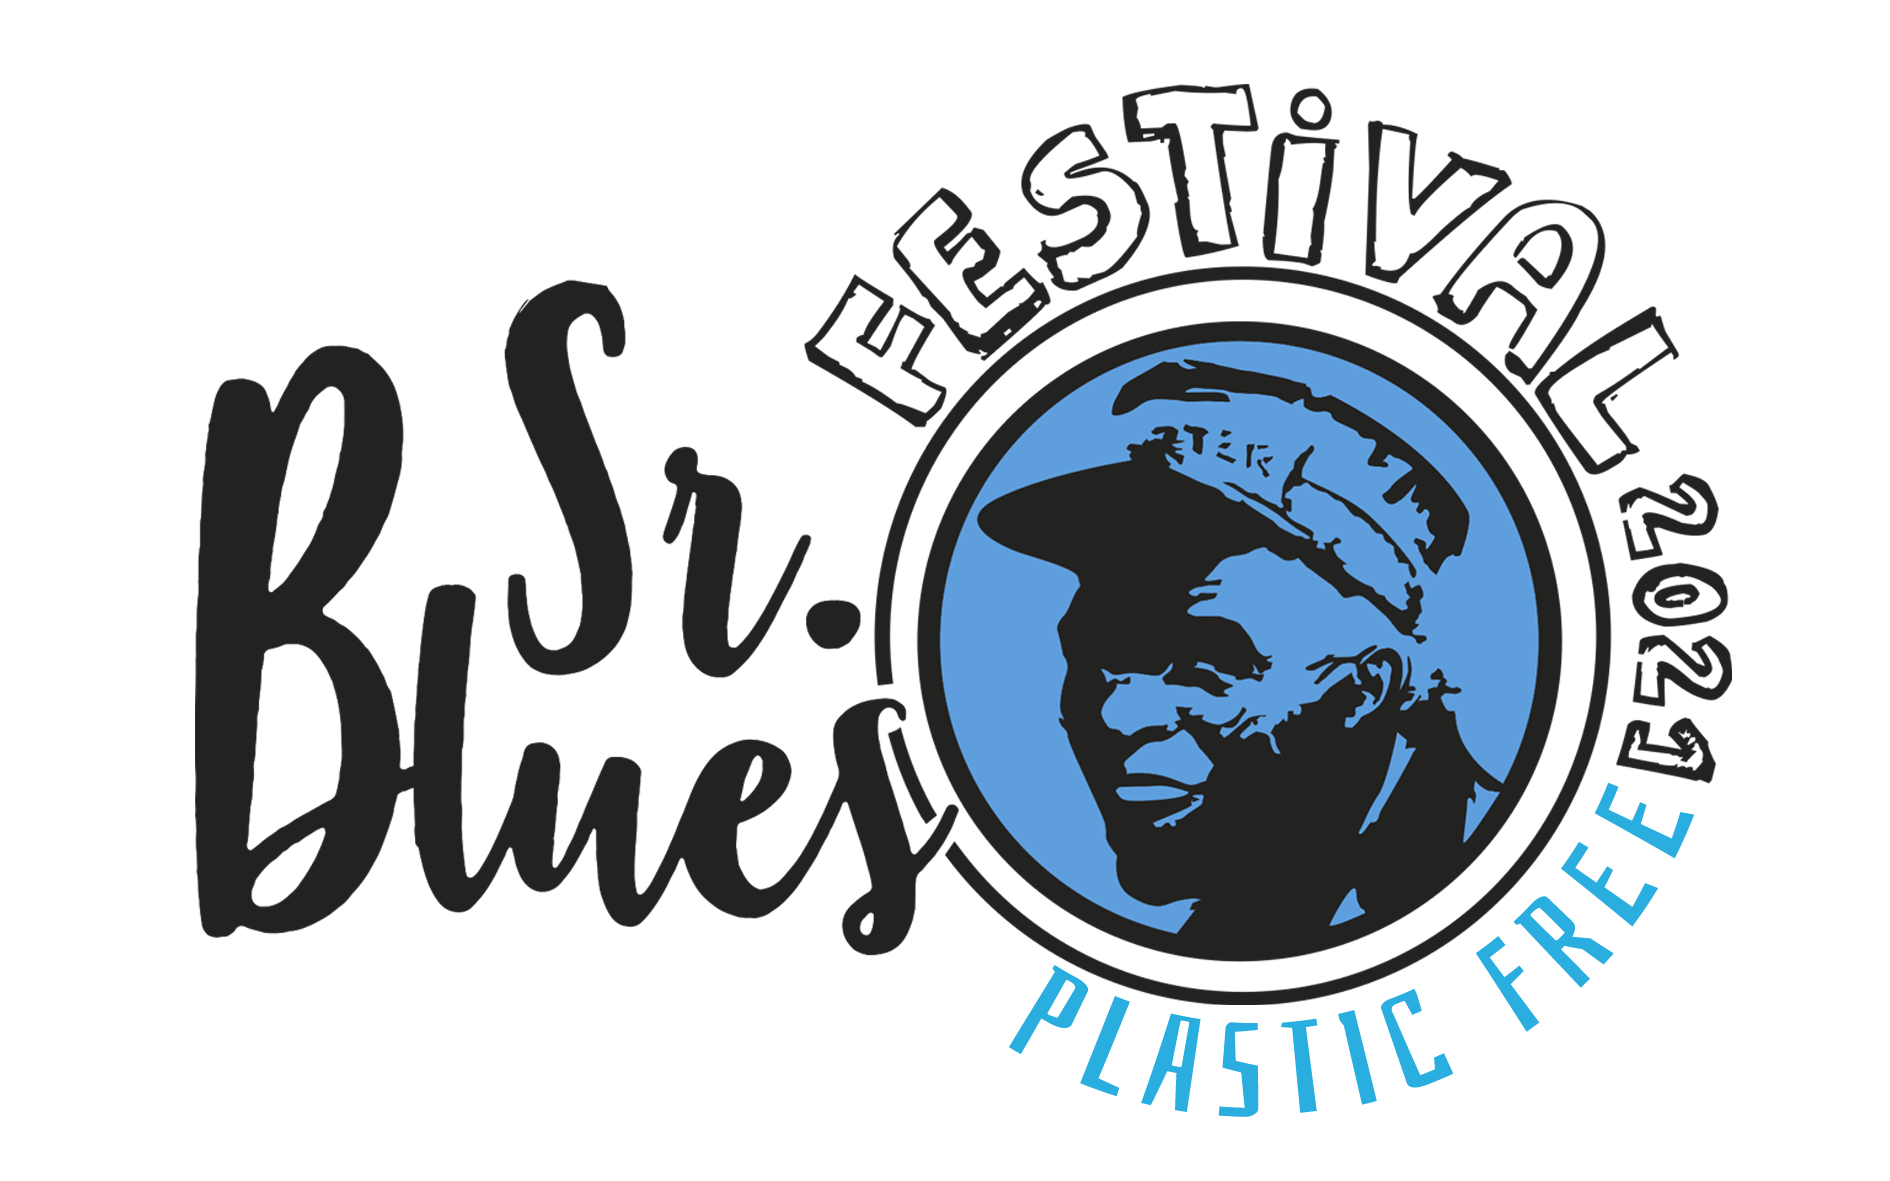 Sr Blues Festival